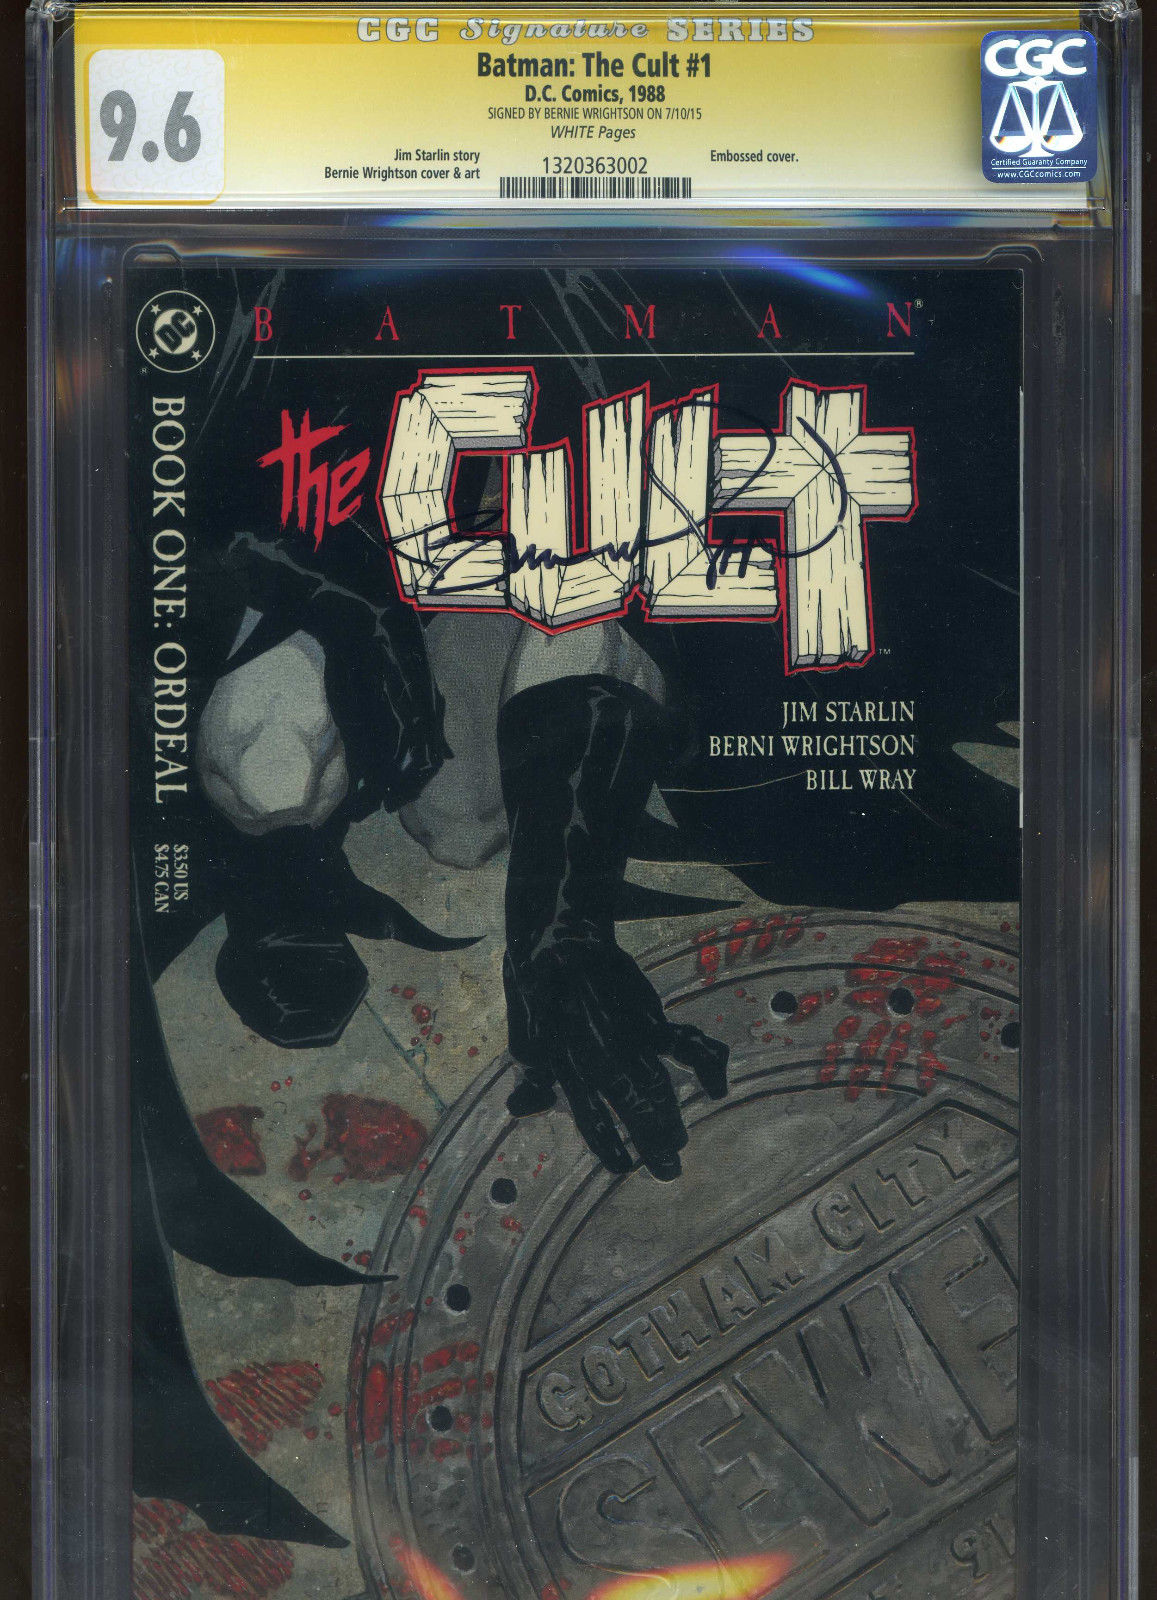 Batman: The Cult #1 CGC 9.6 SS Bernie Wrightson signed autograph